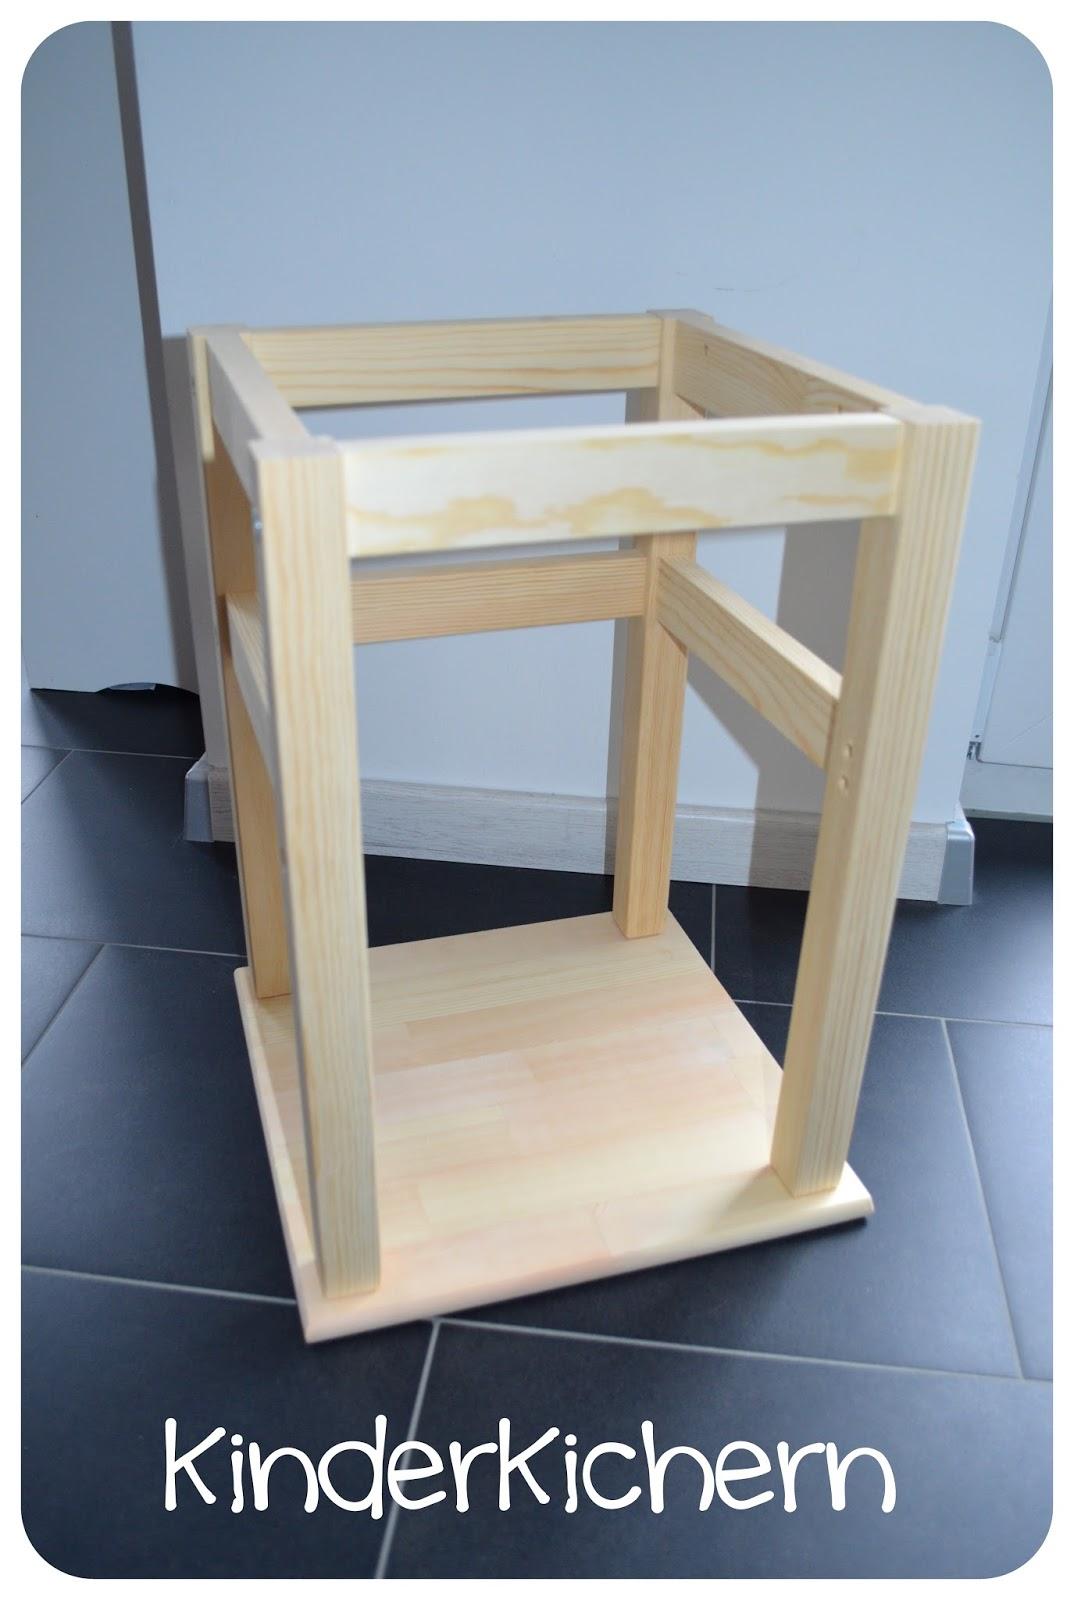 ikea f rh ja wandregal anleitung inspirierendes design f r wohnm bel. Black Bedroom Furniture Sets. Home Design Ideas